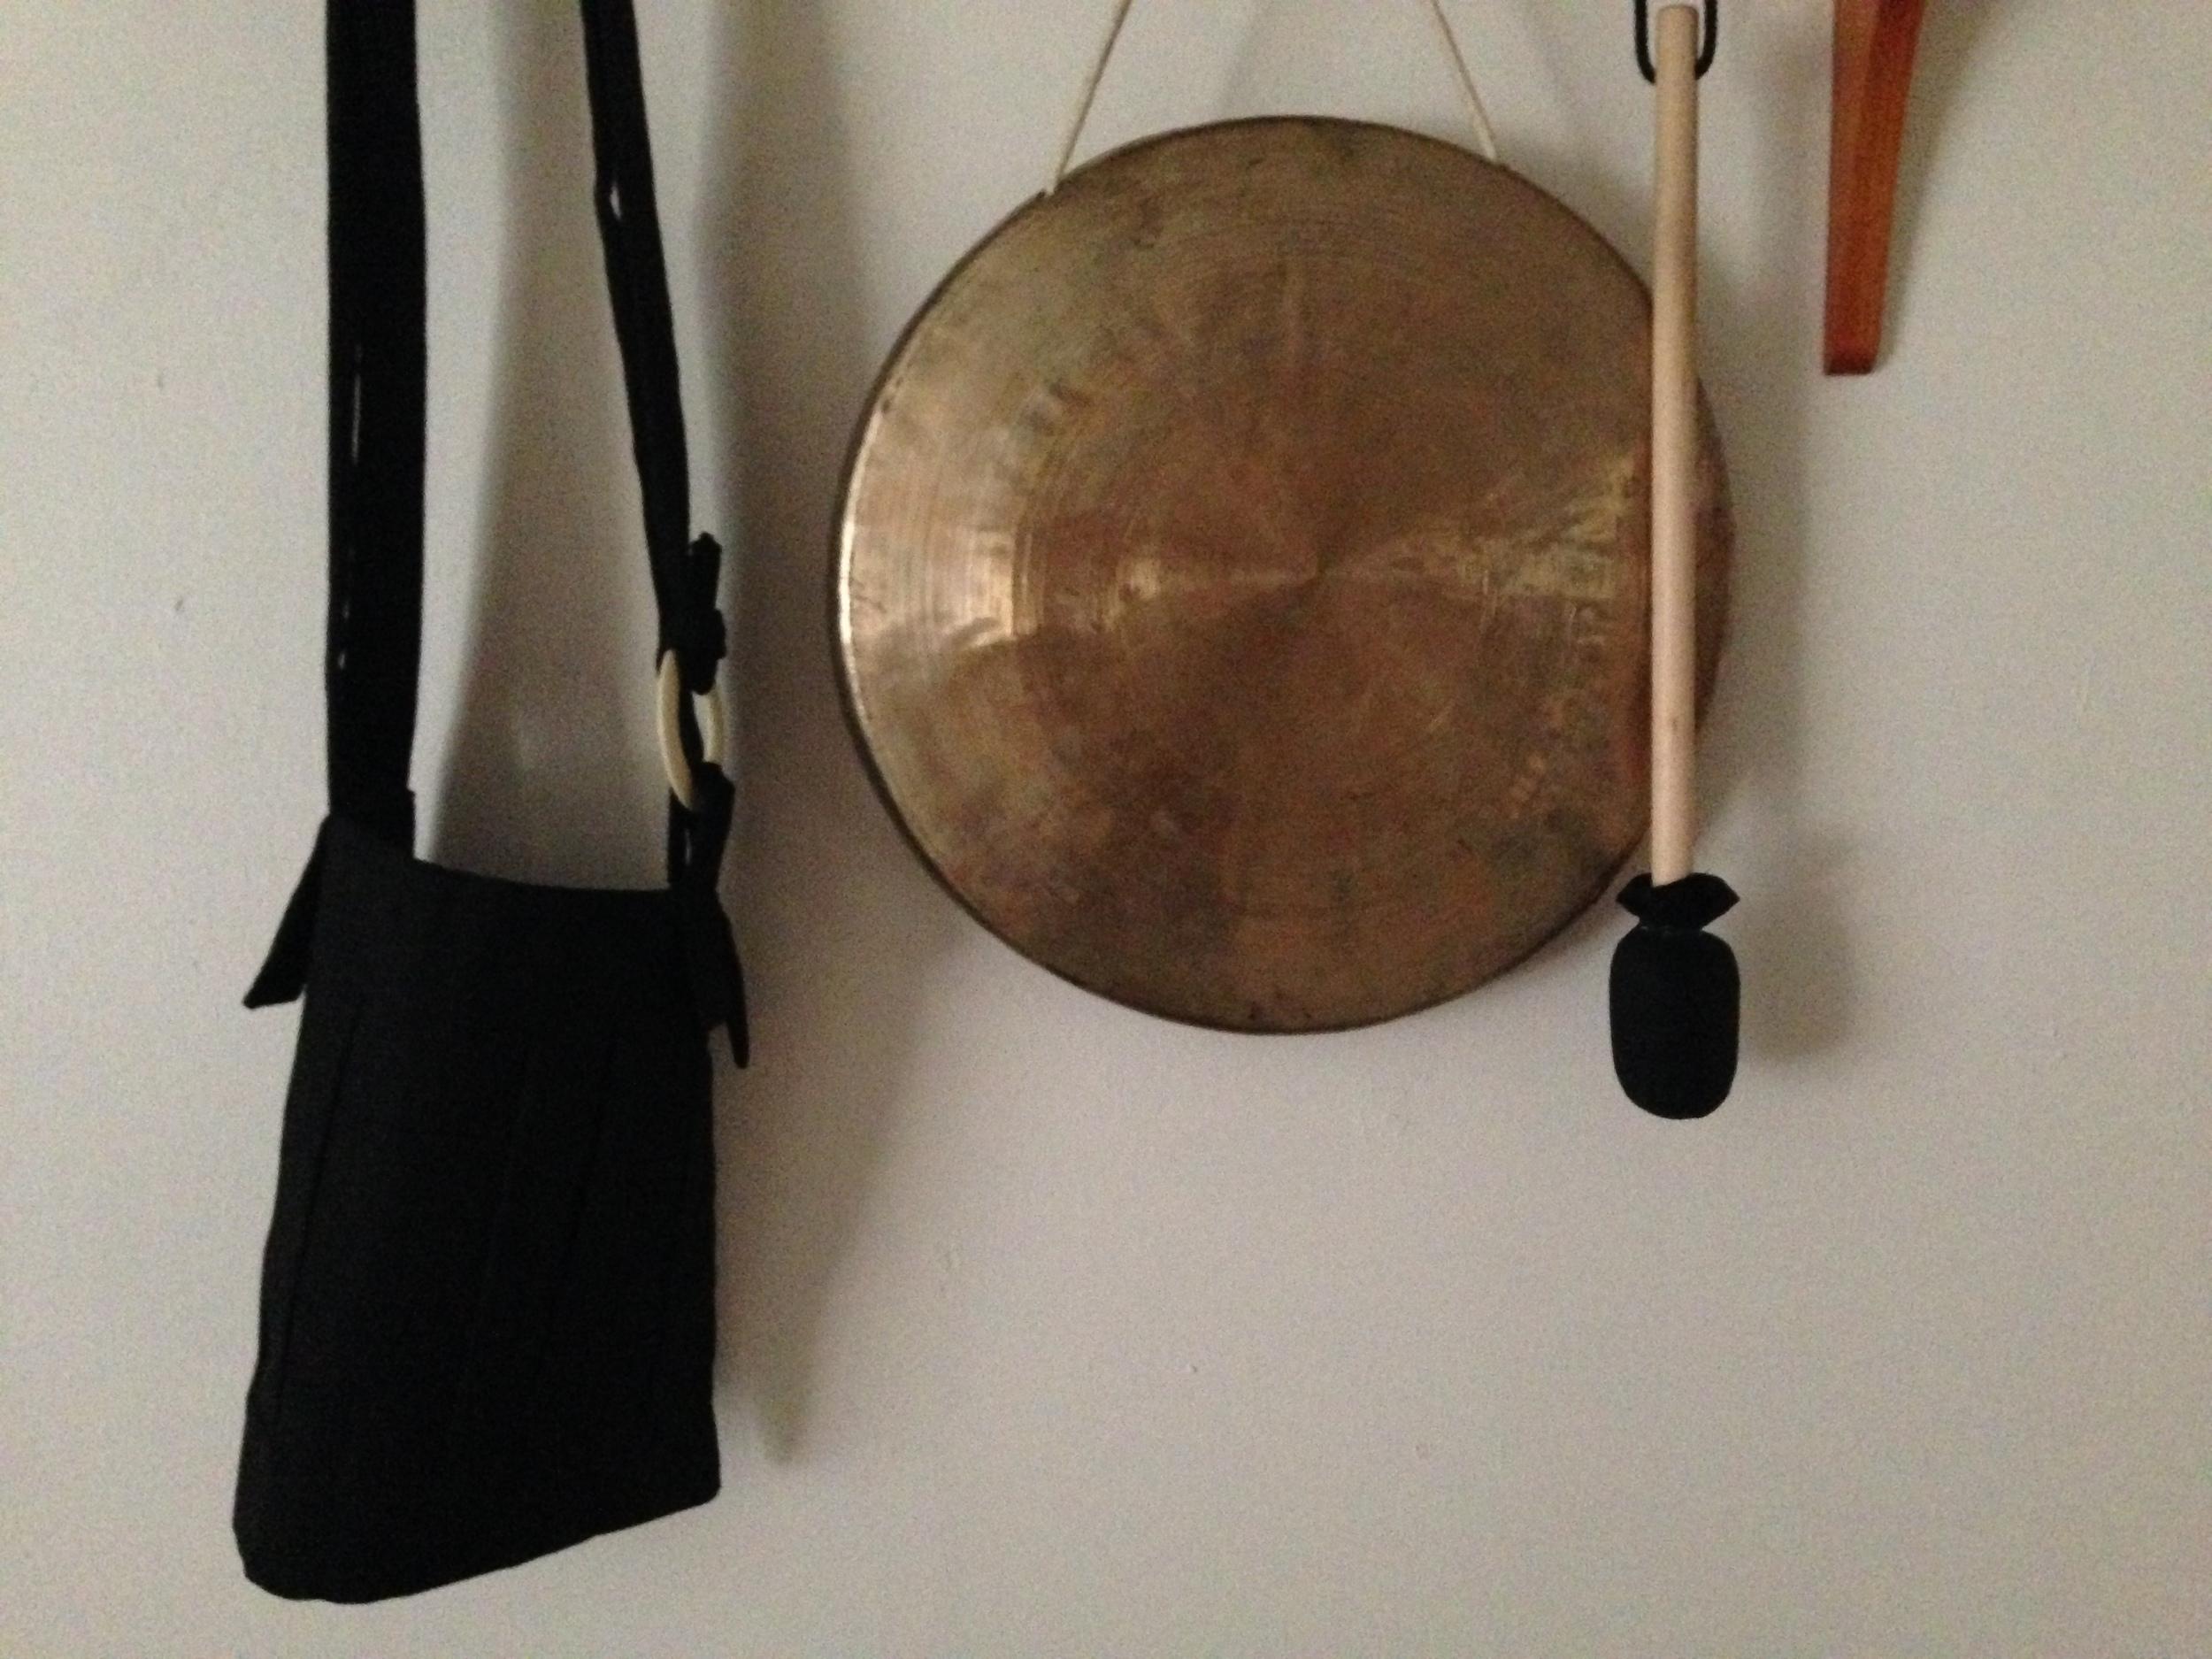 gong1.JPG